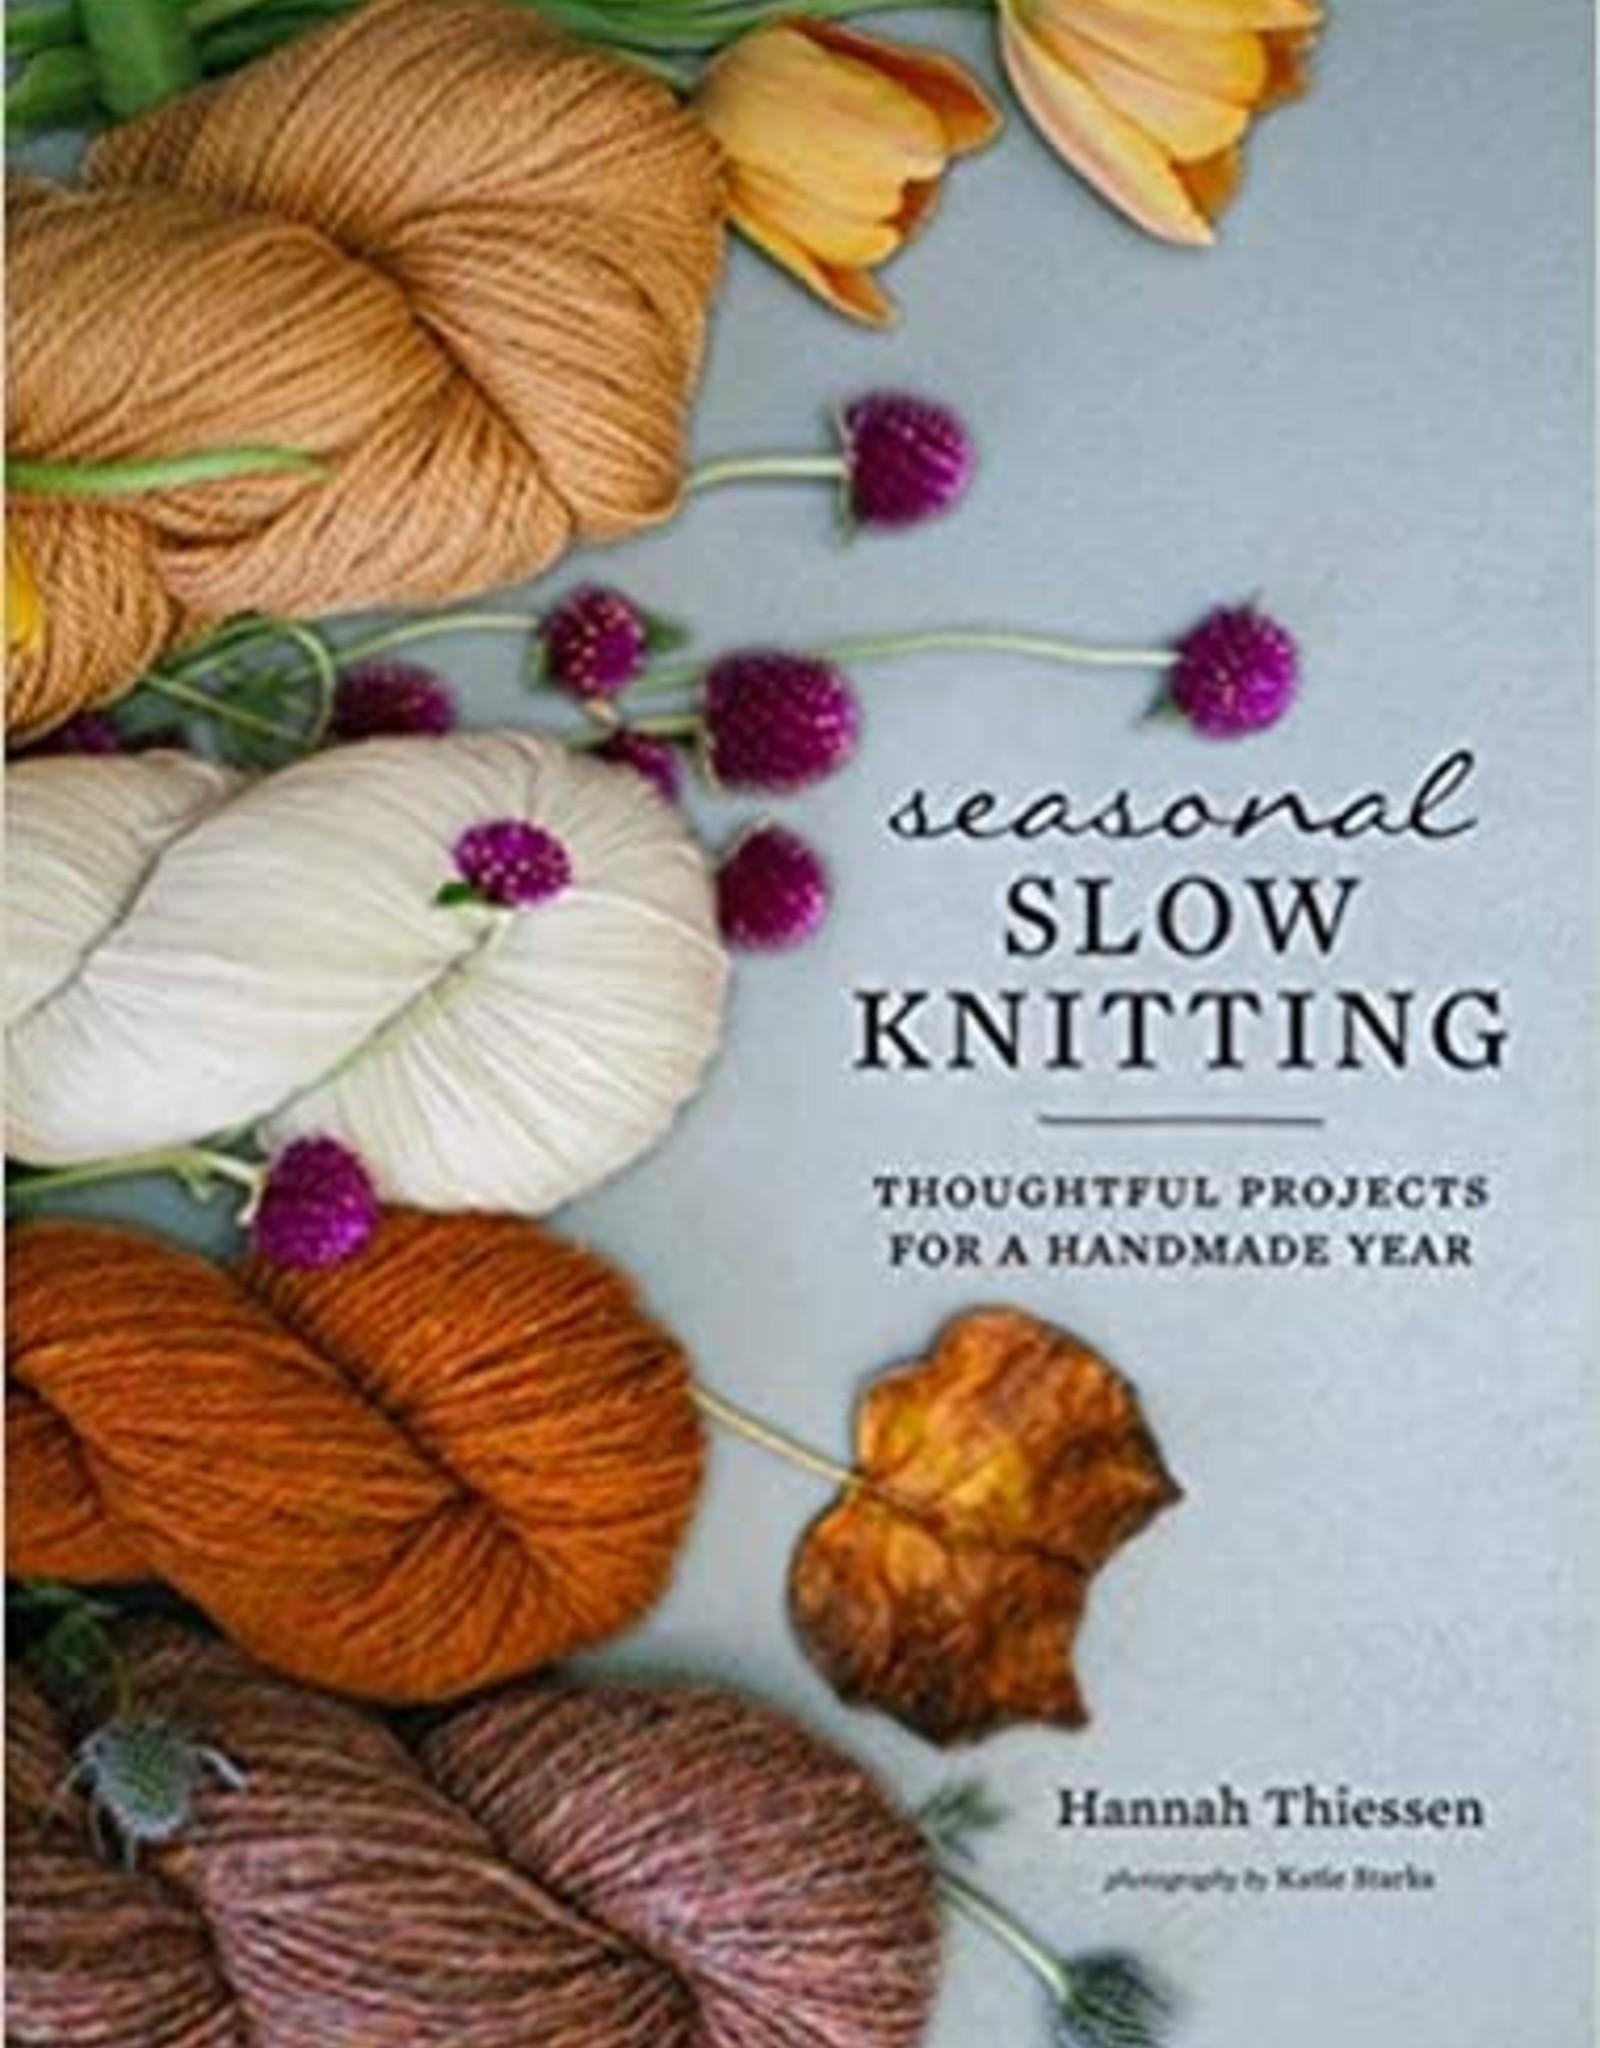 Seasonal Slow Knitting by Hannah Thiessen